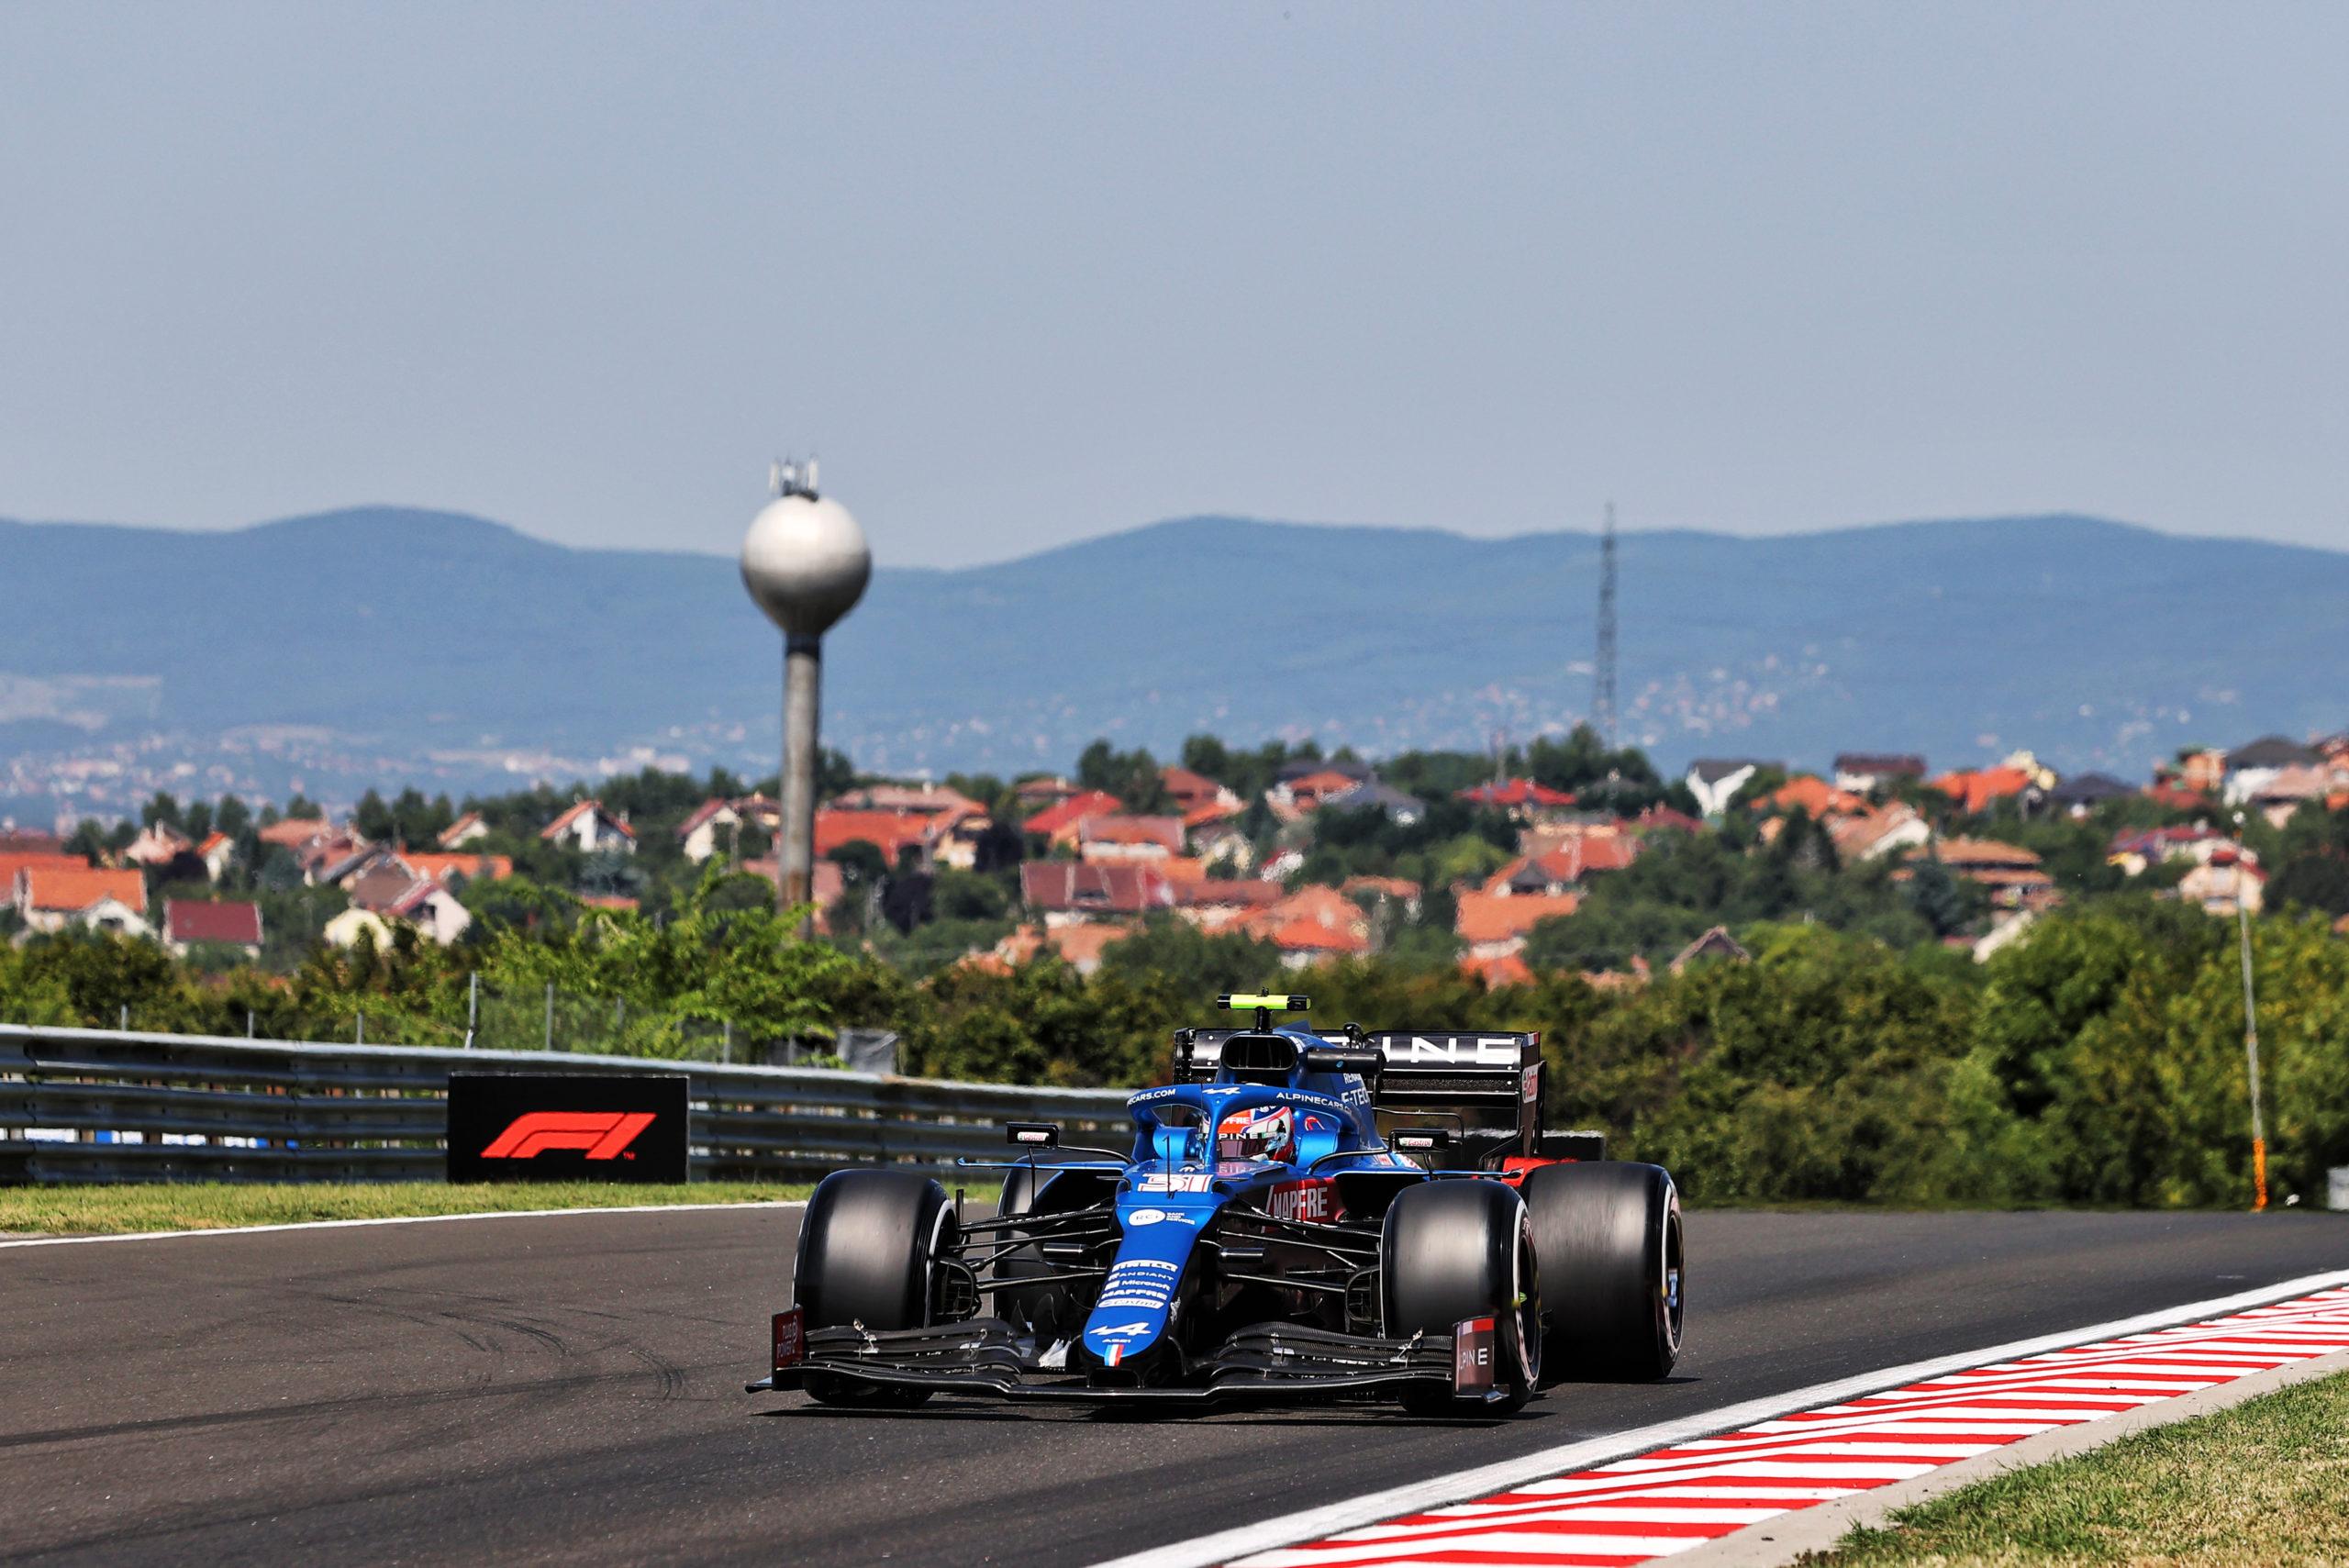 Esteban Ocon (FRA) Alpine F1 Team A521, F1 Grand Prix of Hungary at Hungaroring on July 30, 2021